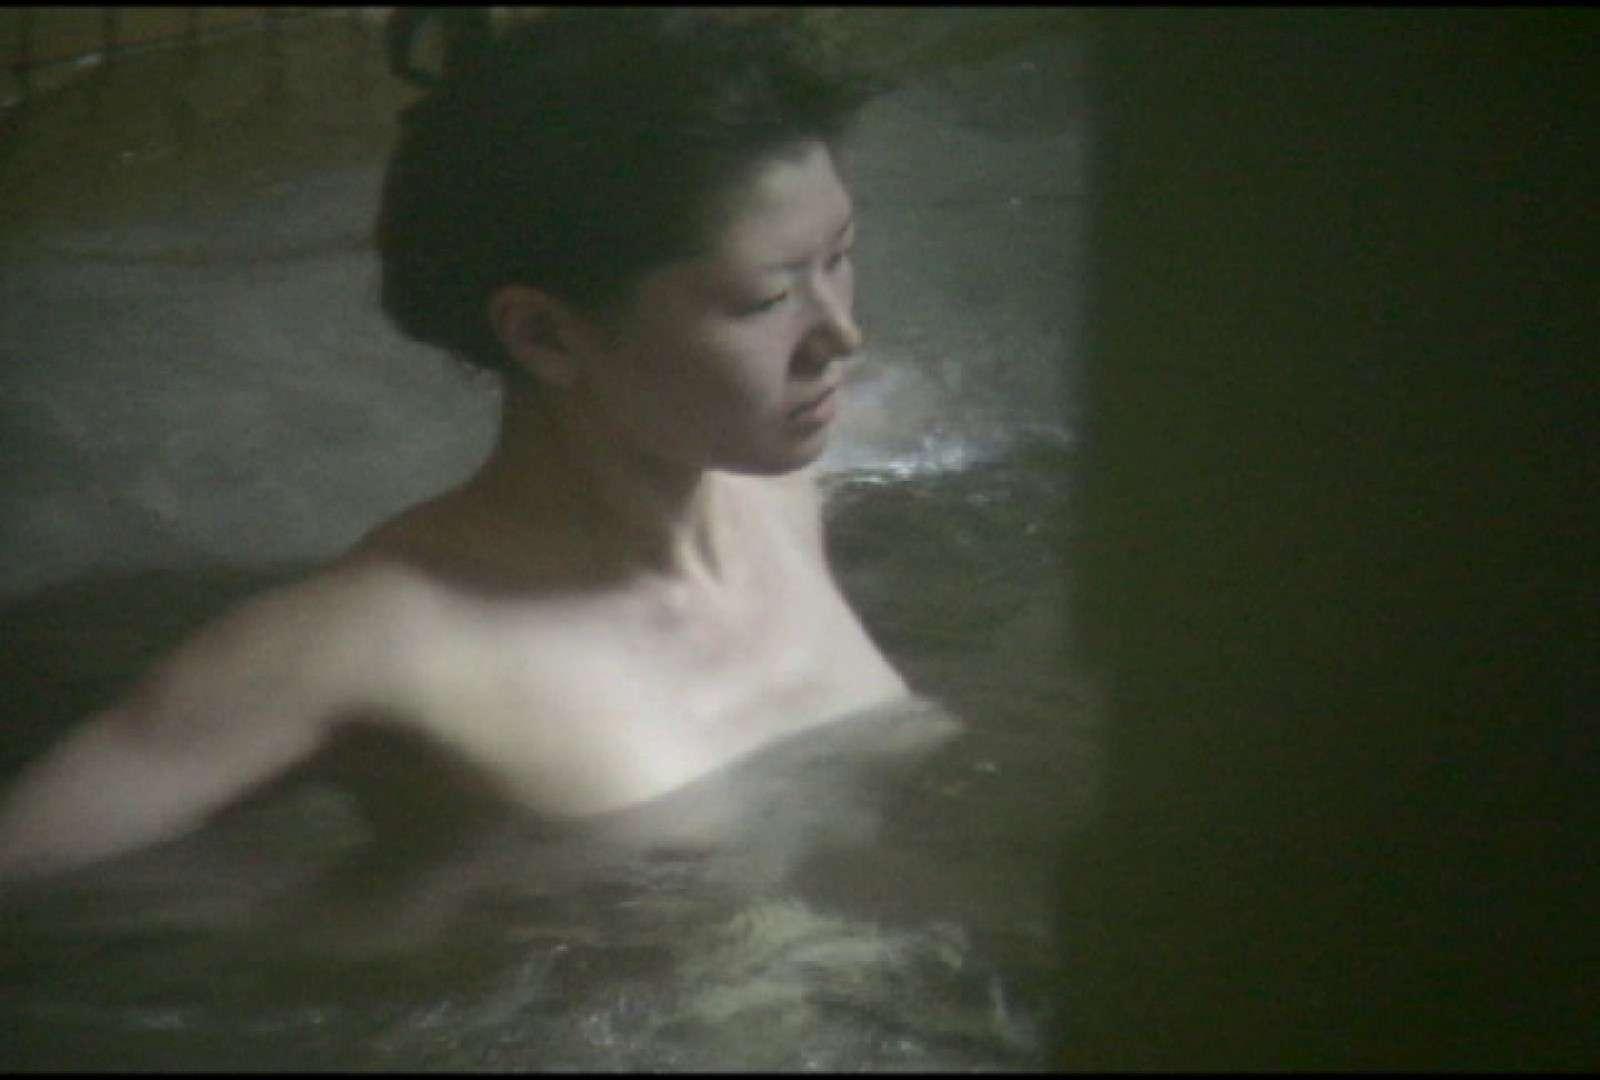 Aquaな露天風呂Vol.699 盗撮師作品 AV無料 101pic 59